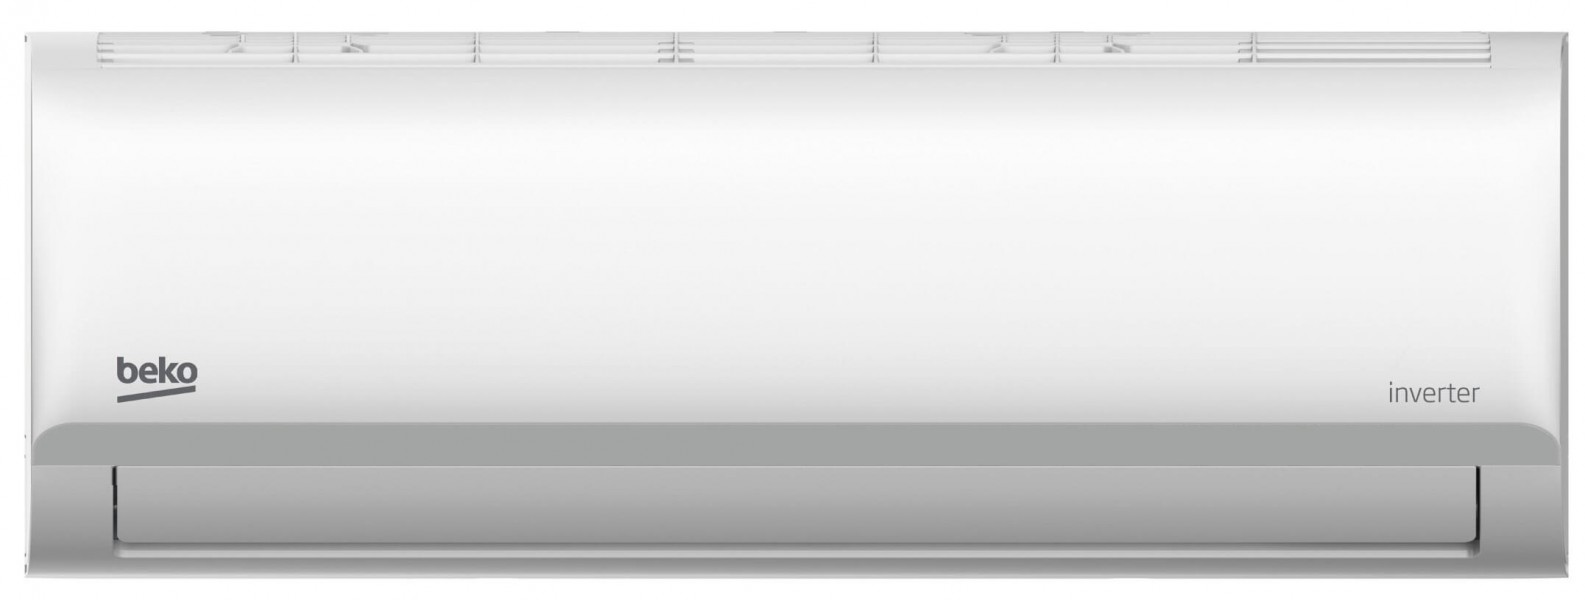 Aer conditionat BRVPF090